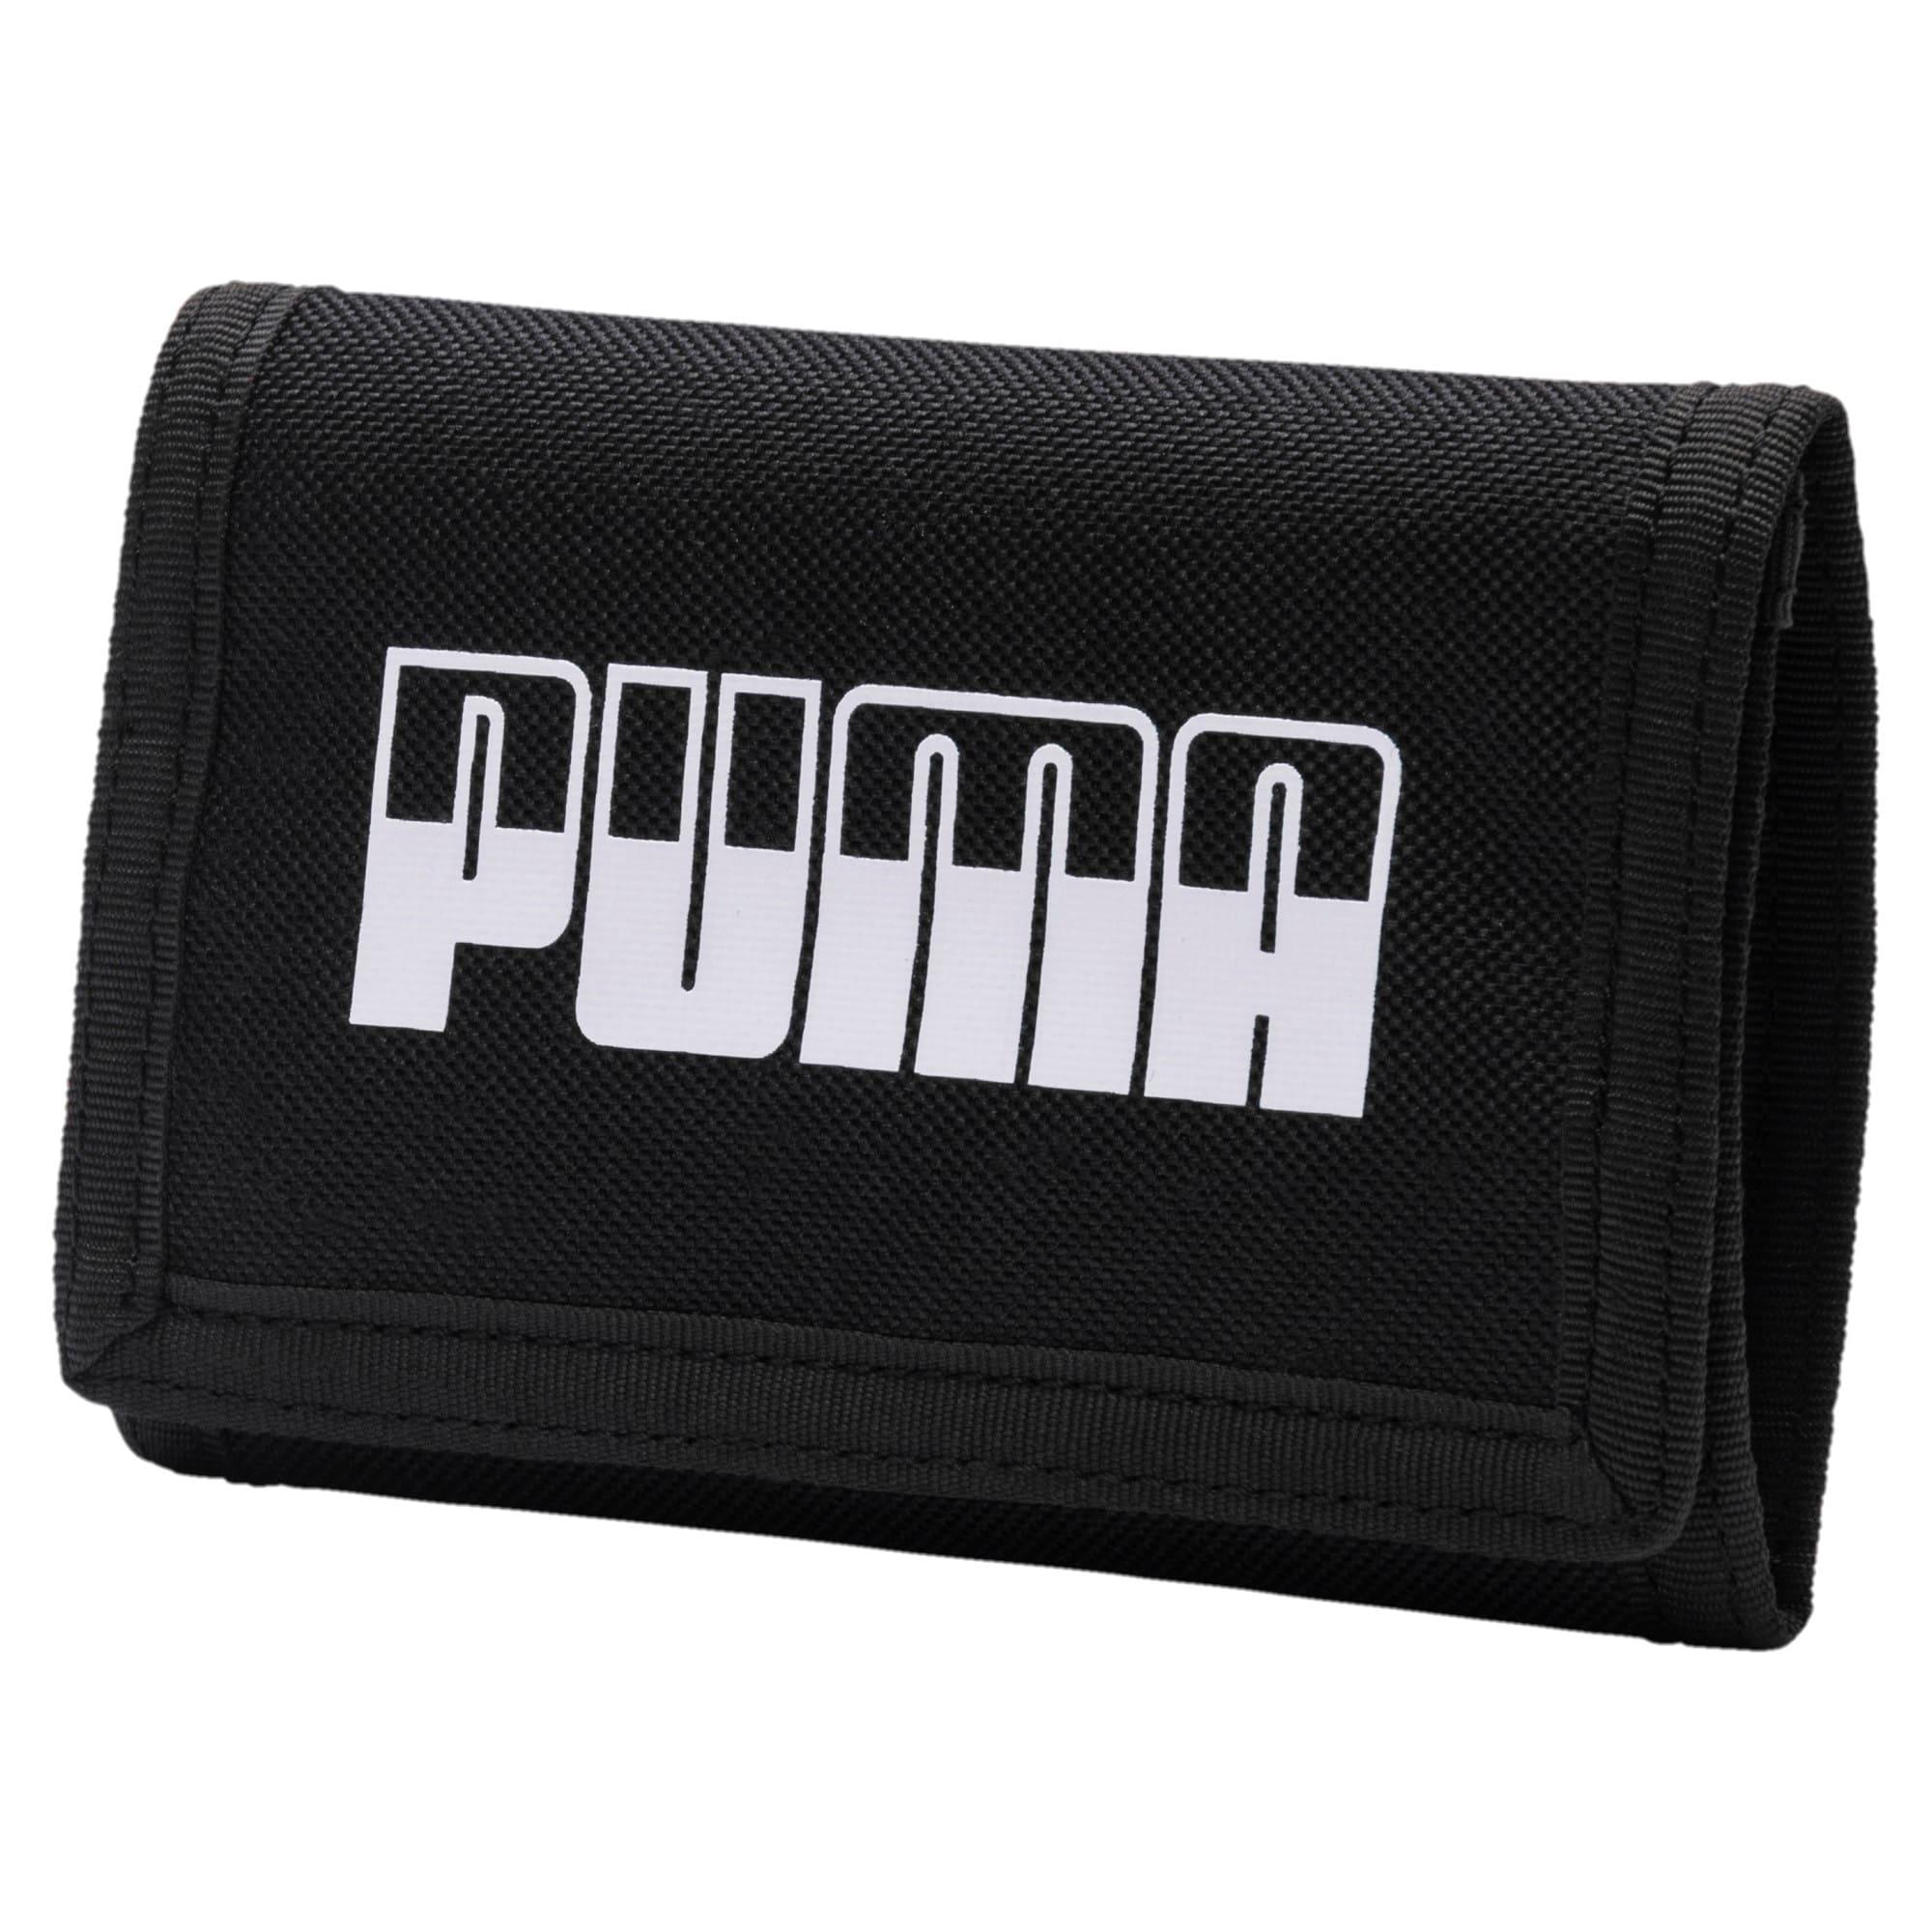 Thumbnail 1 of プーマ プラス ウォレット II, Puma Black, medium-JPN